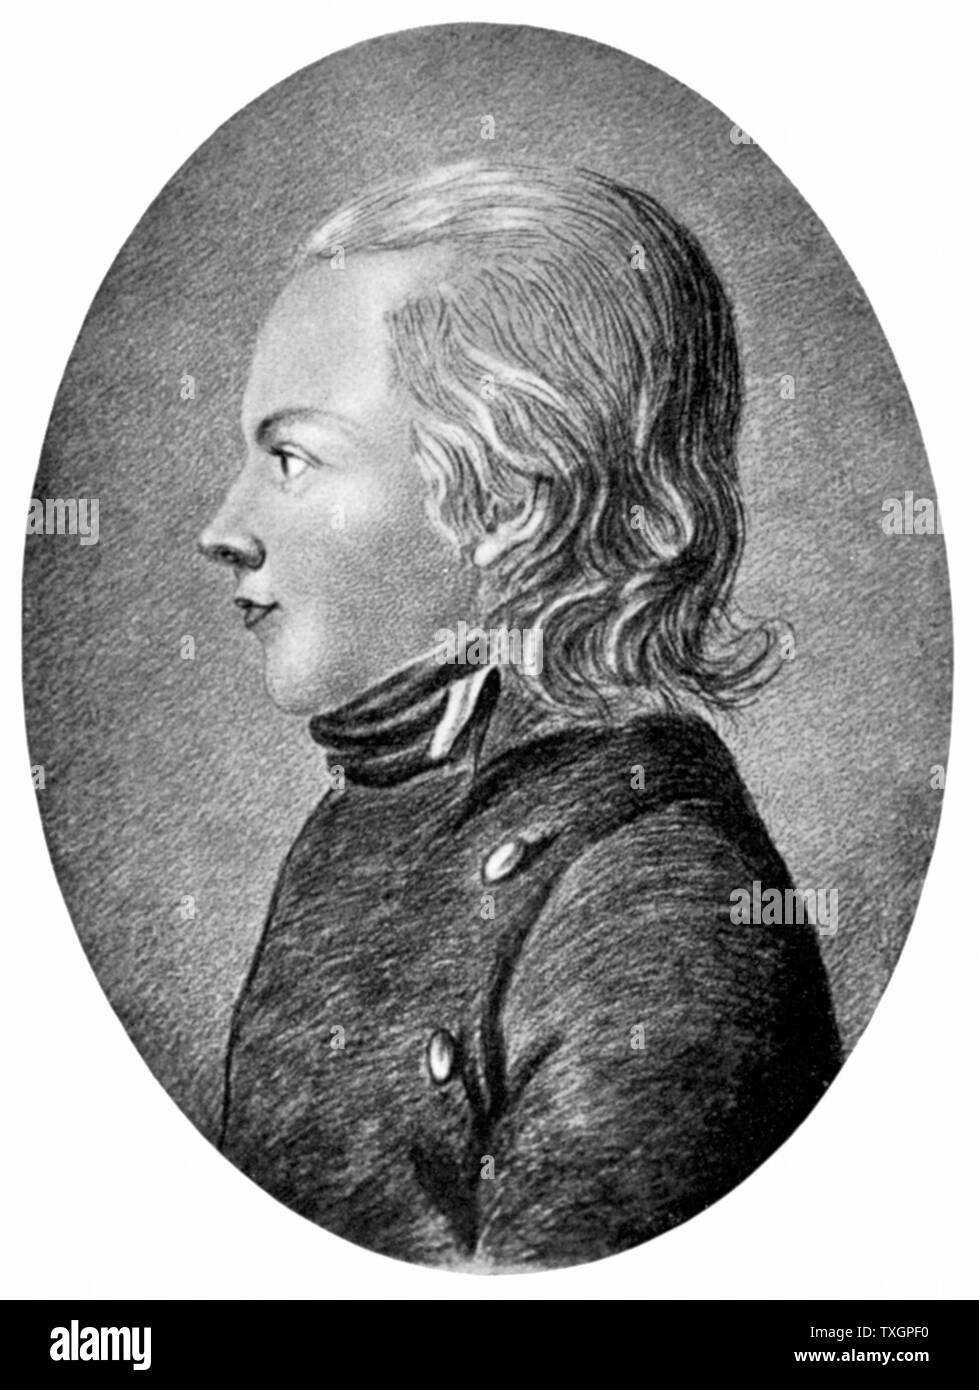 Novalis (pseudonymn of Friedrich von Hardenberg 1772-1801) German Romantic poet and novelist. 'Prophet of Romanticism'. Engraving - Stock Image